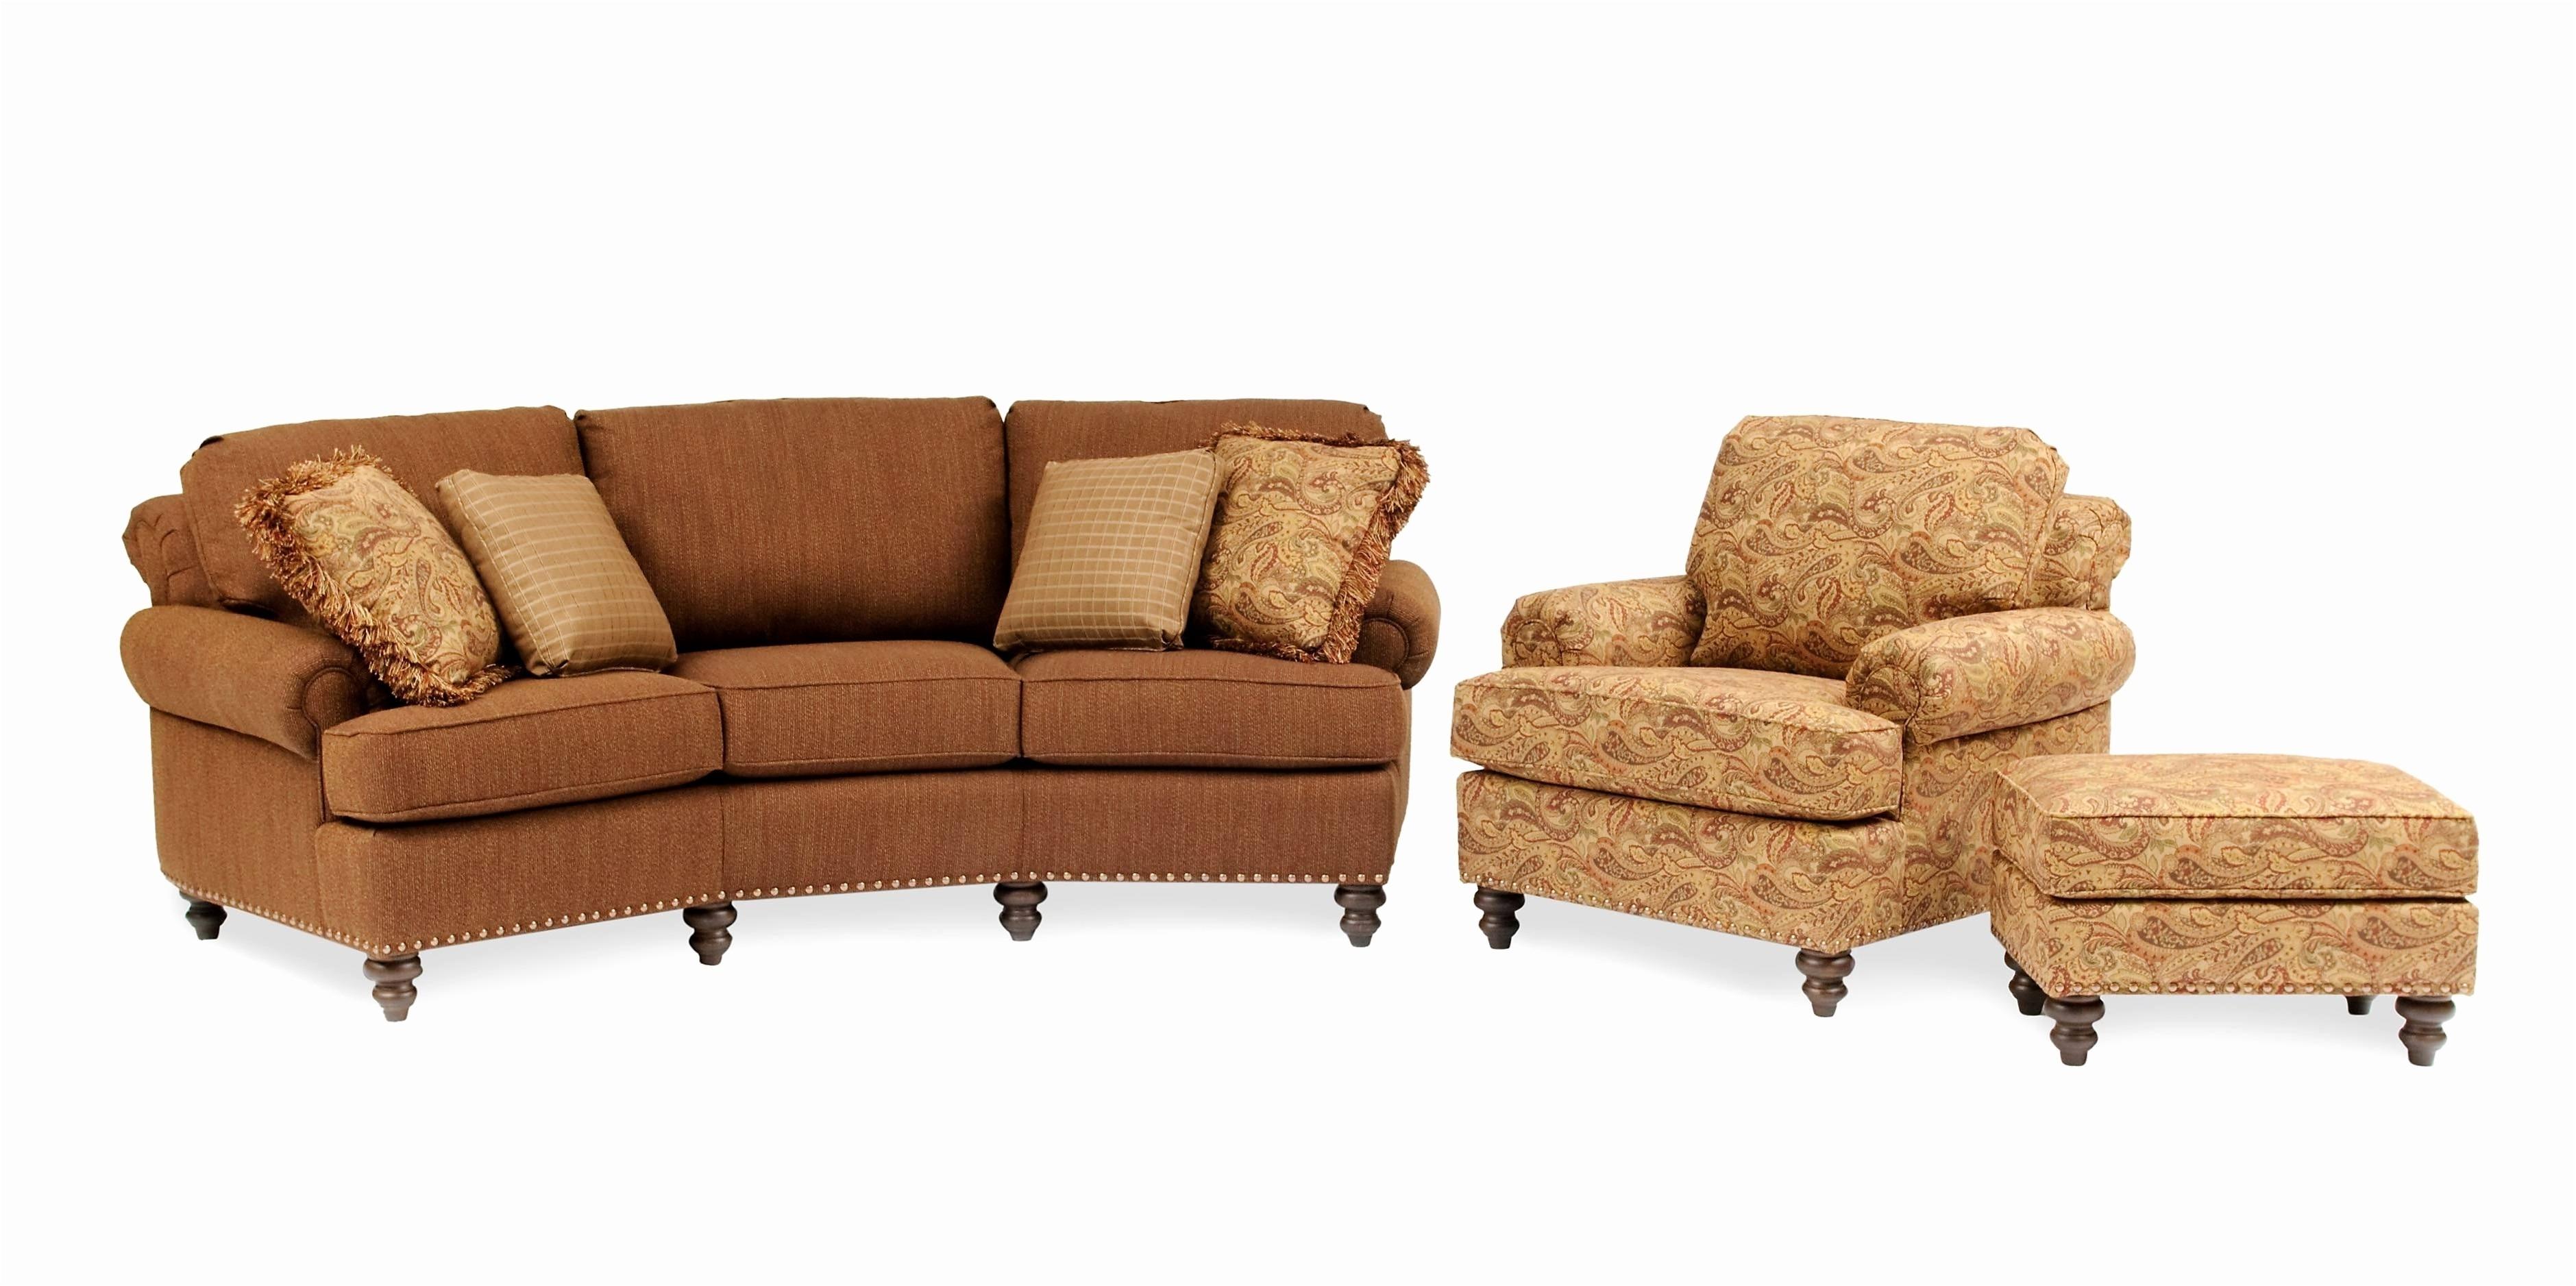 Most Popular Sofa : Nebraska Furniture Mart Sectional Sofa Cinematic Everest For Nebraska Furniture Mart Sectional Sofas (View 6 of 15)